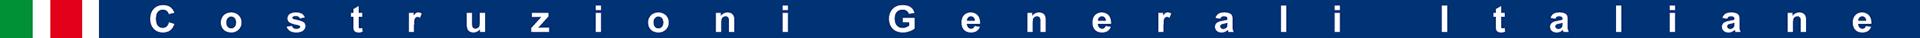 Ristrutturazione edilizia | MB GeoTeam | Impresa Edile